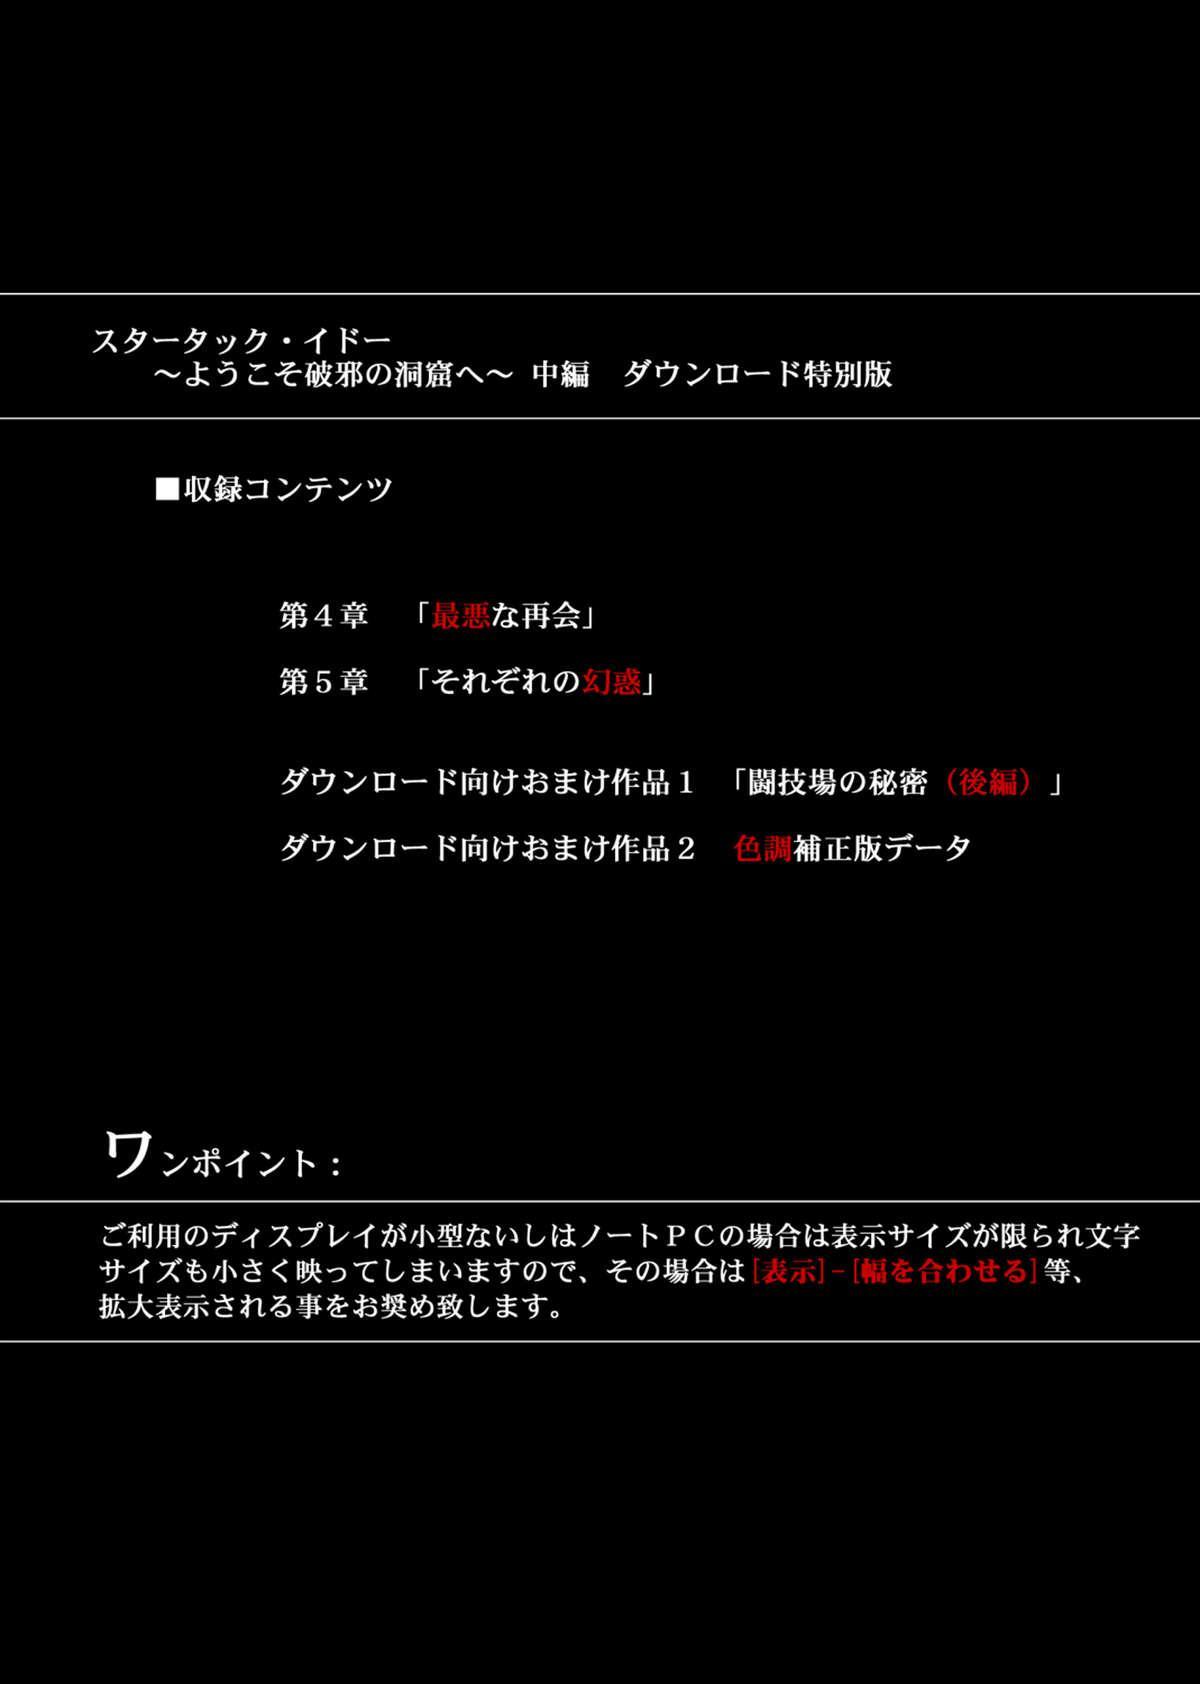 [Cyclone (Reizei, Izumi)] STAR TAC IDO ~Youkuso Haja no Doukutsu he~ Chuuhen Download edition (Dragon Warrior: Dai's Great Adventure) [Digital] 1